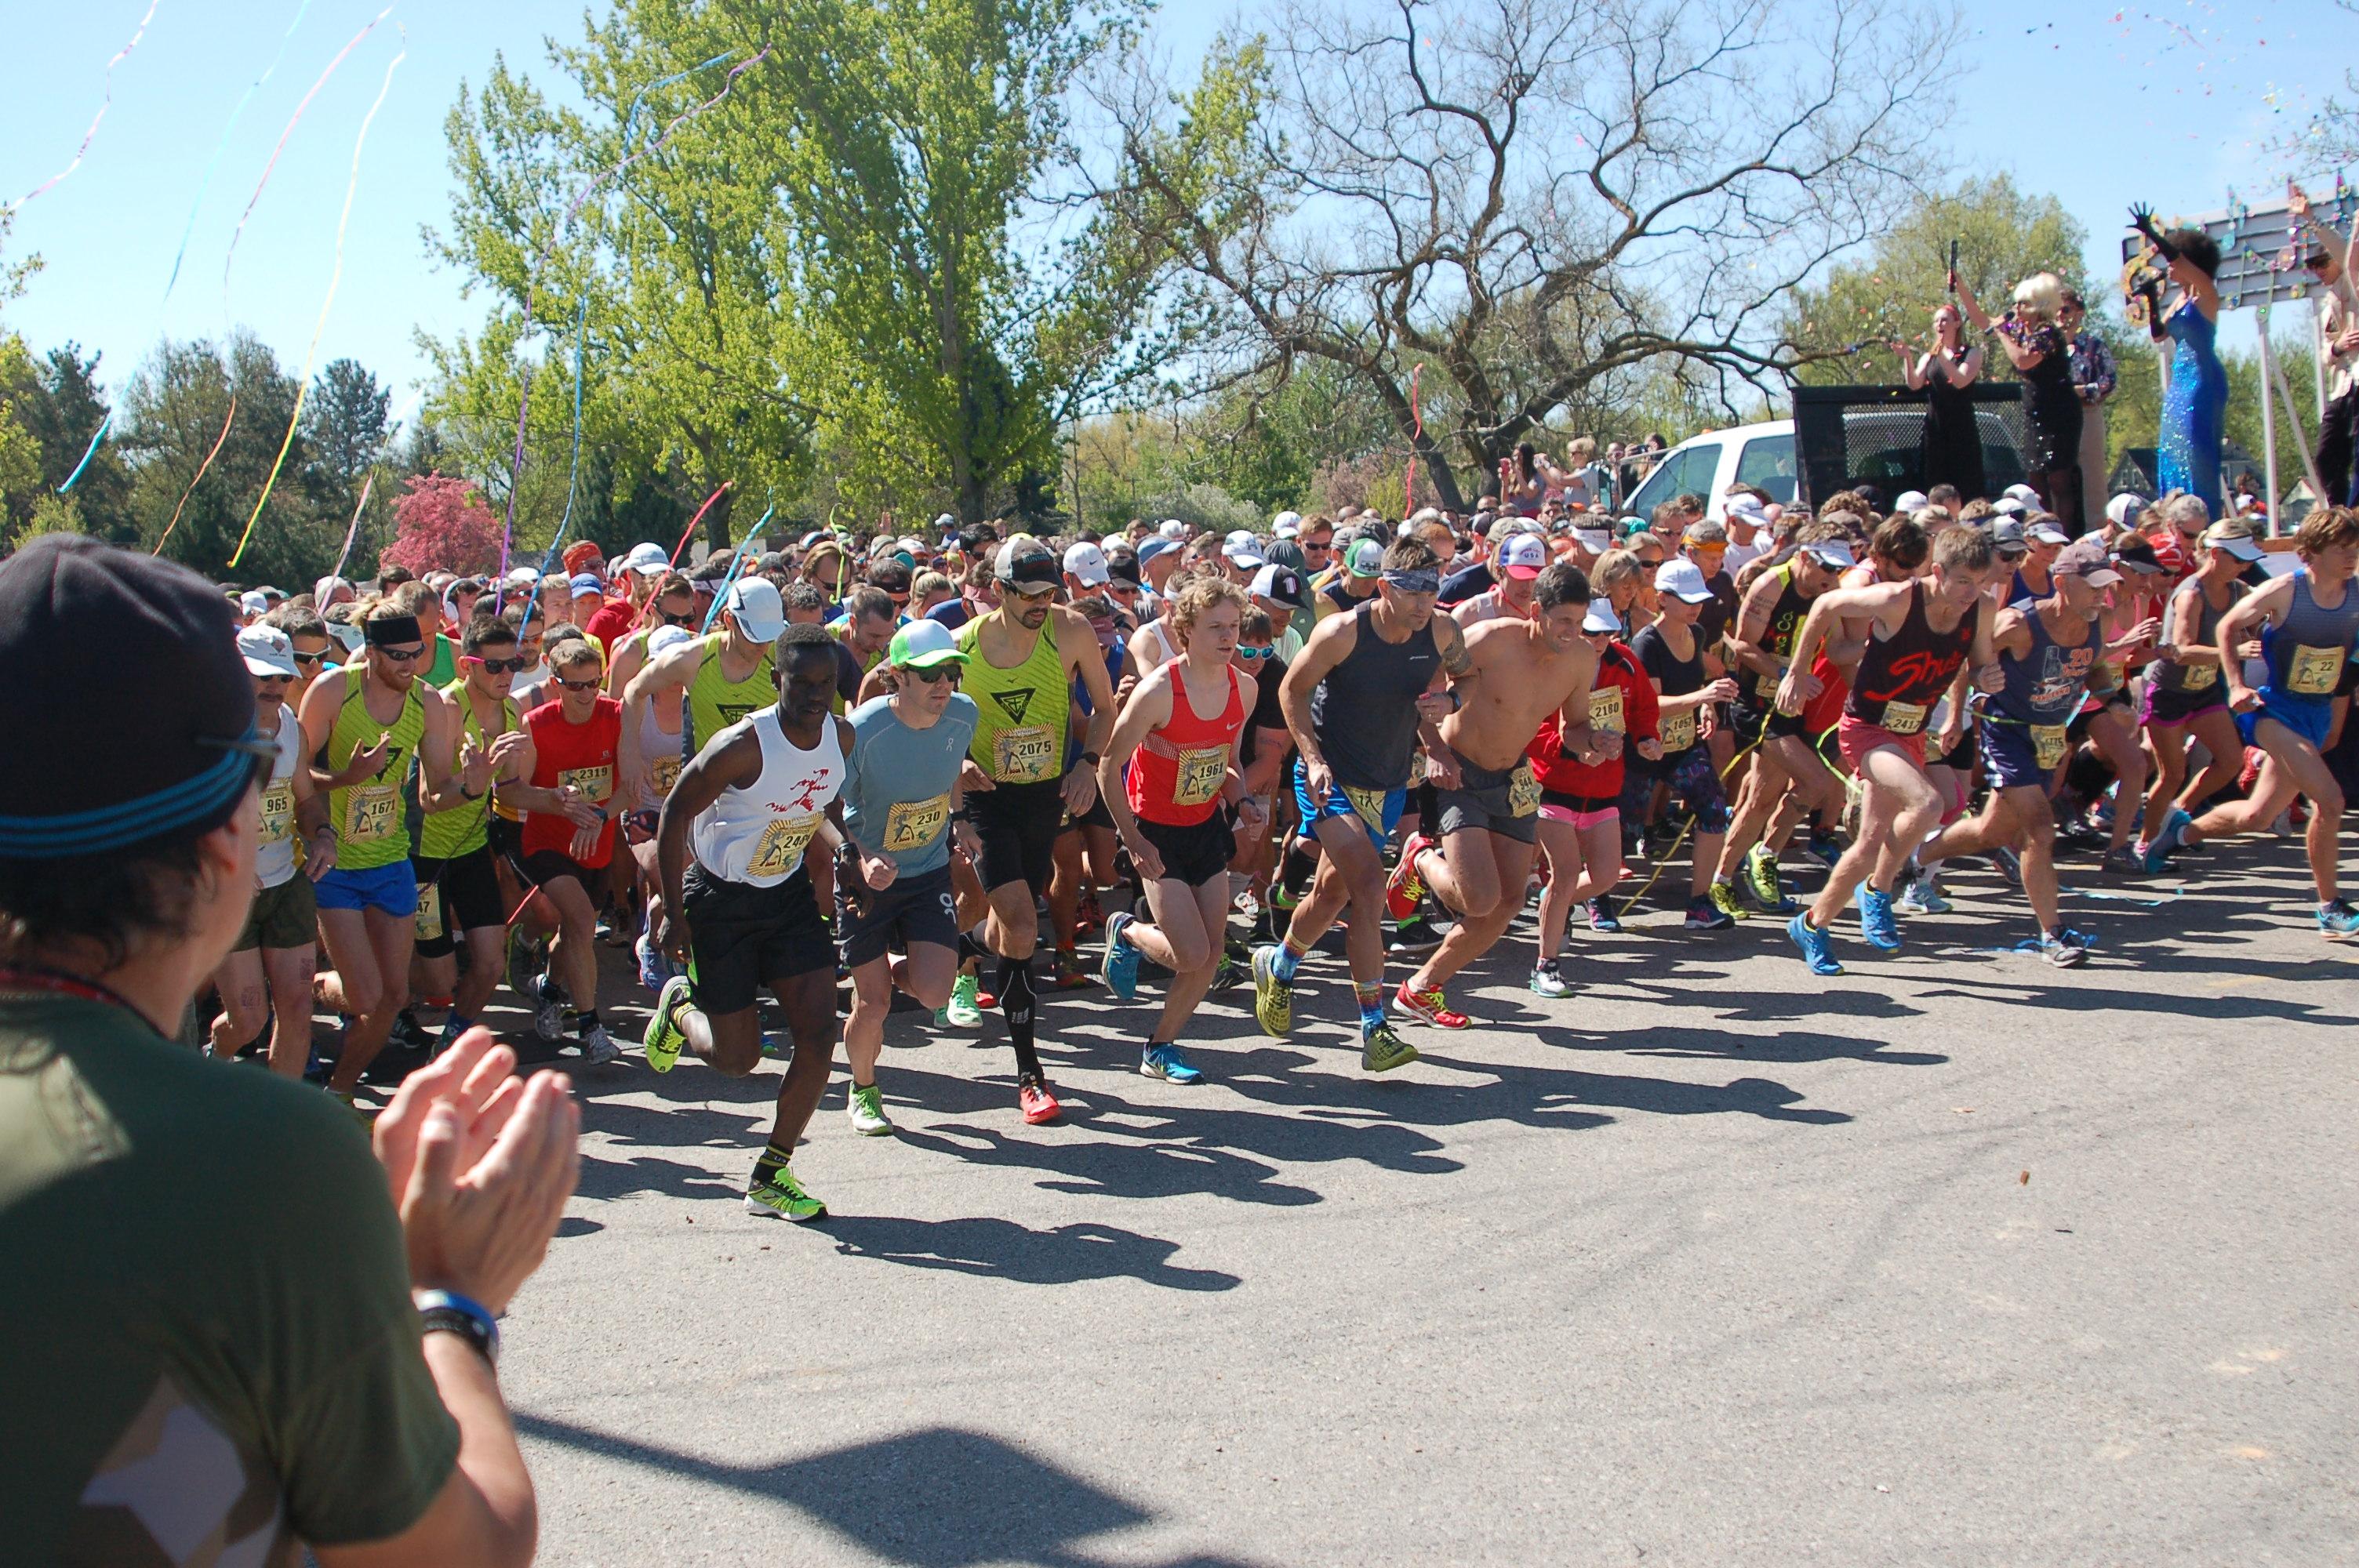 2016 Race to Robie Creek - Starting Take Off